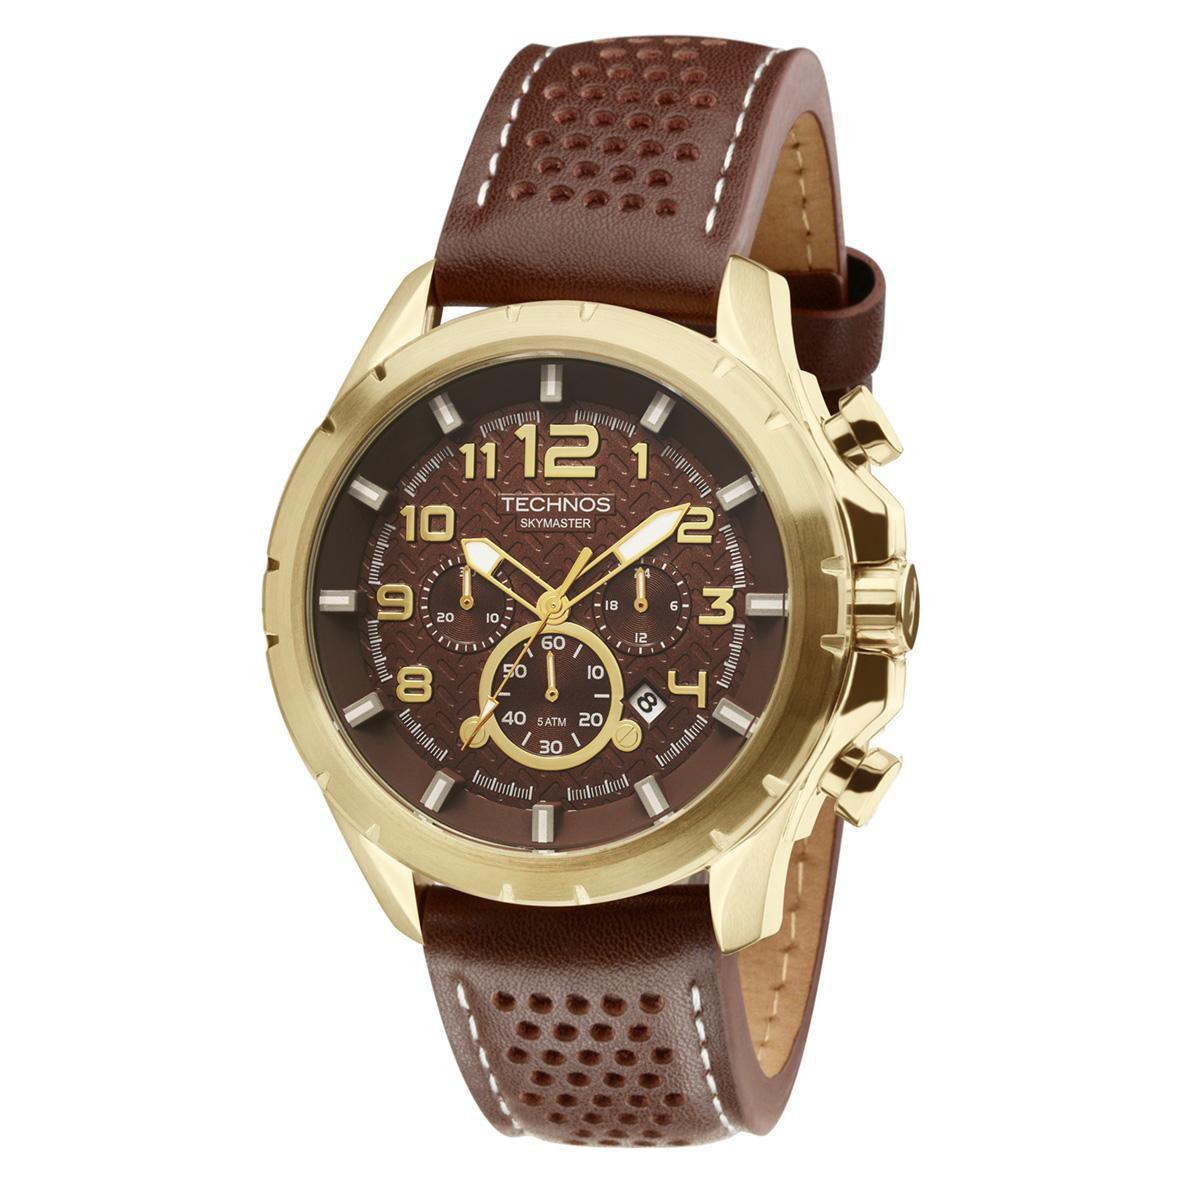 6085d628cc4 Relógio Masculino Technos Skymaster JS25BG 0M 48mm Couro Marrom